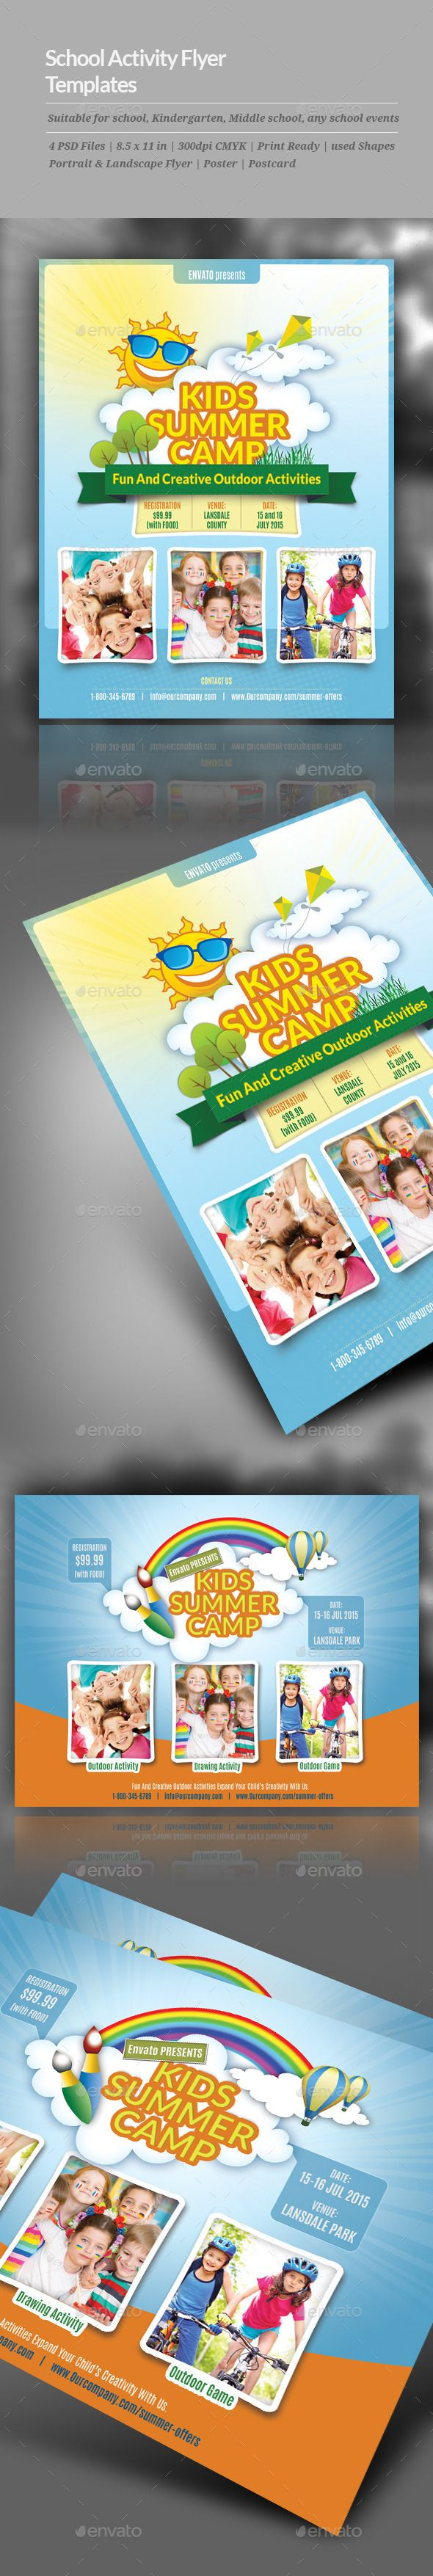 12 best design templates for school images on pinterest